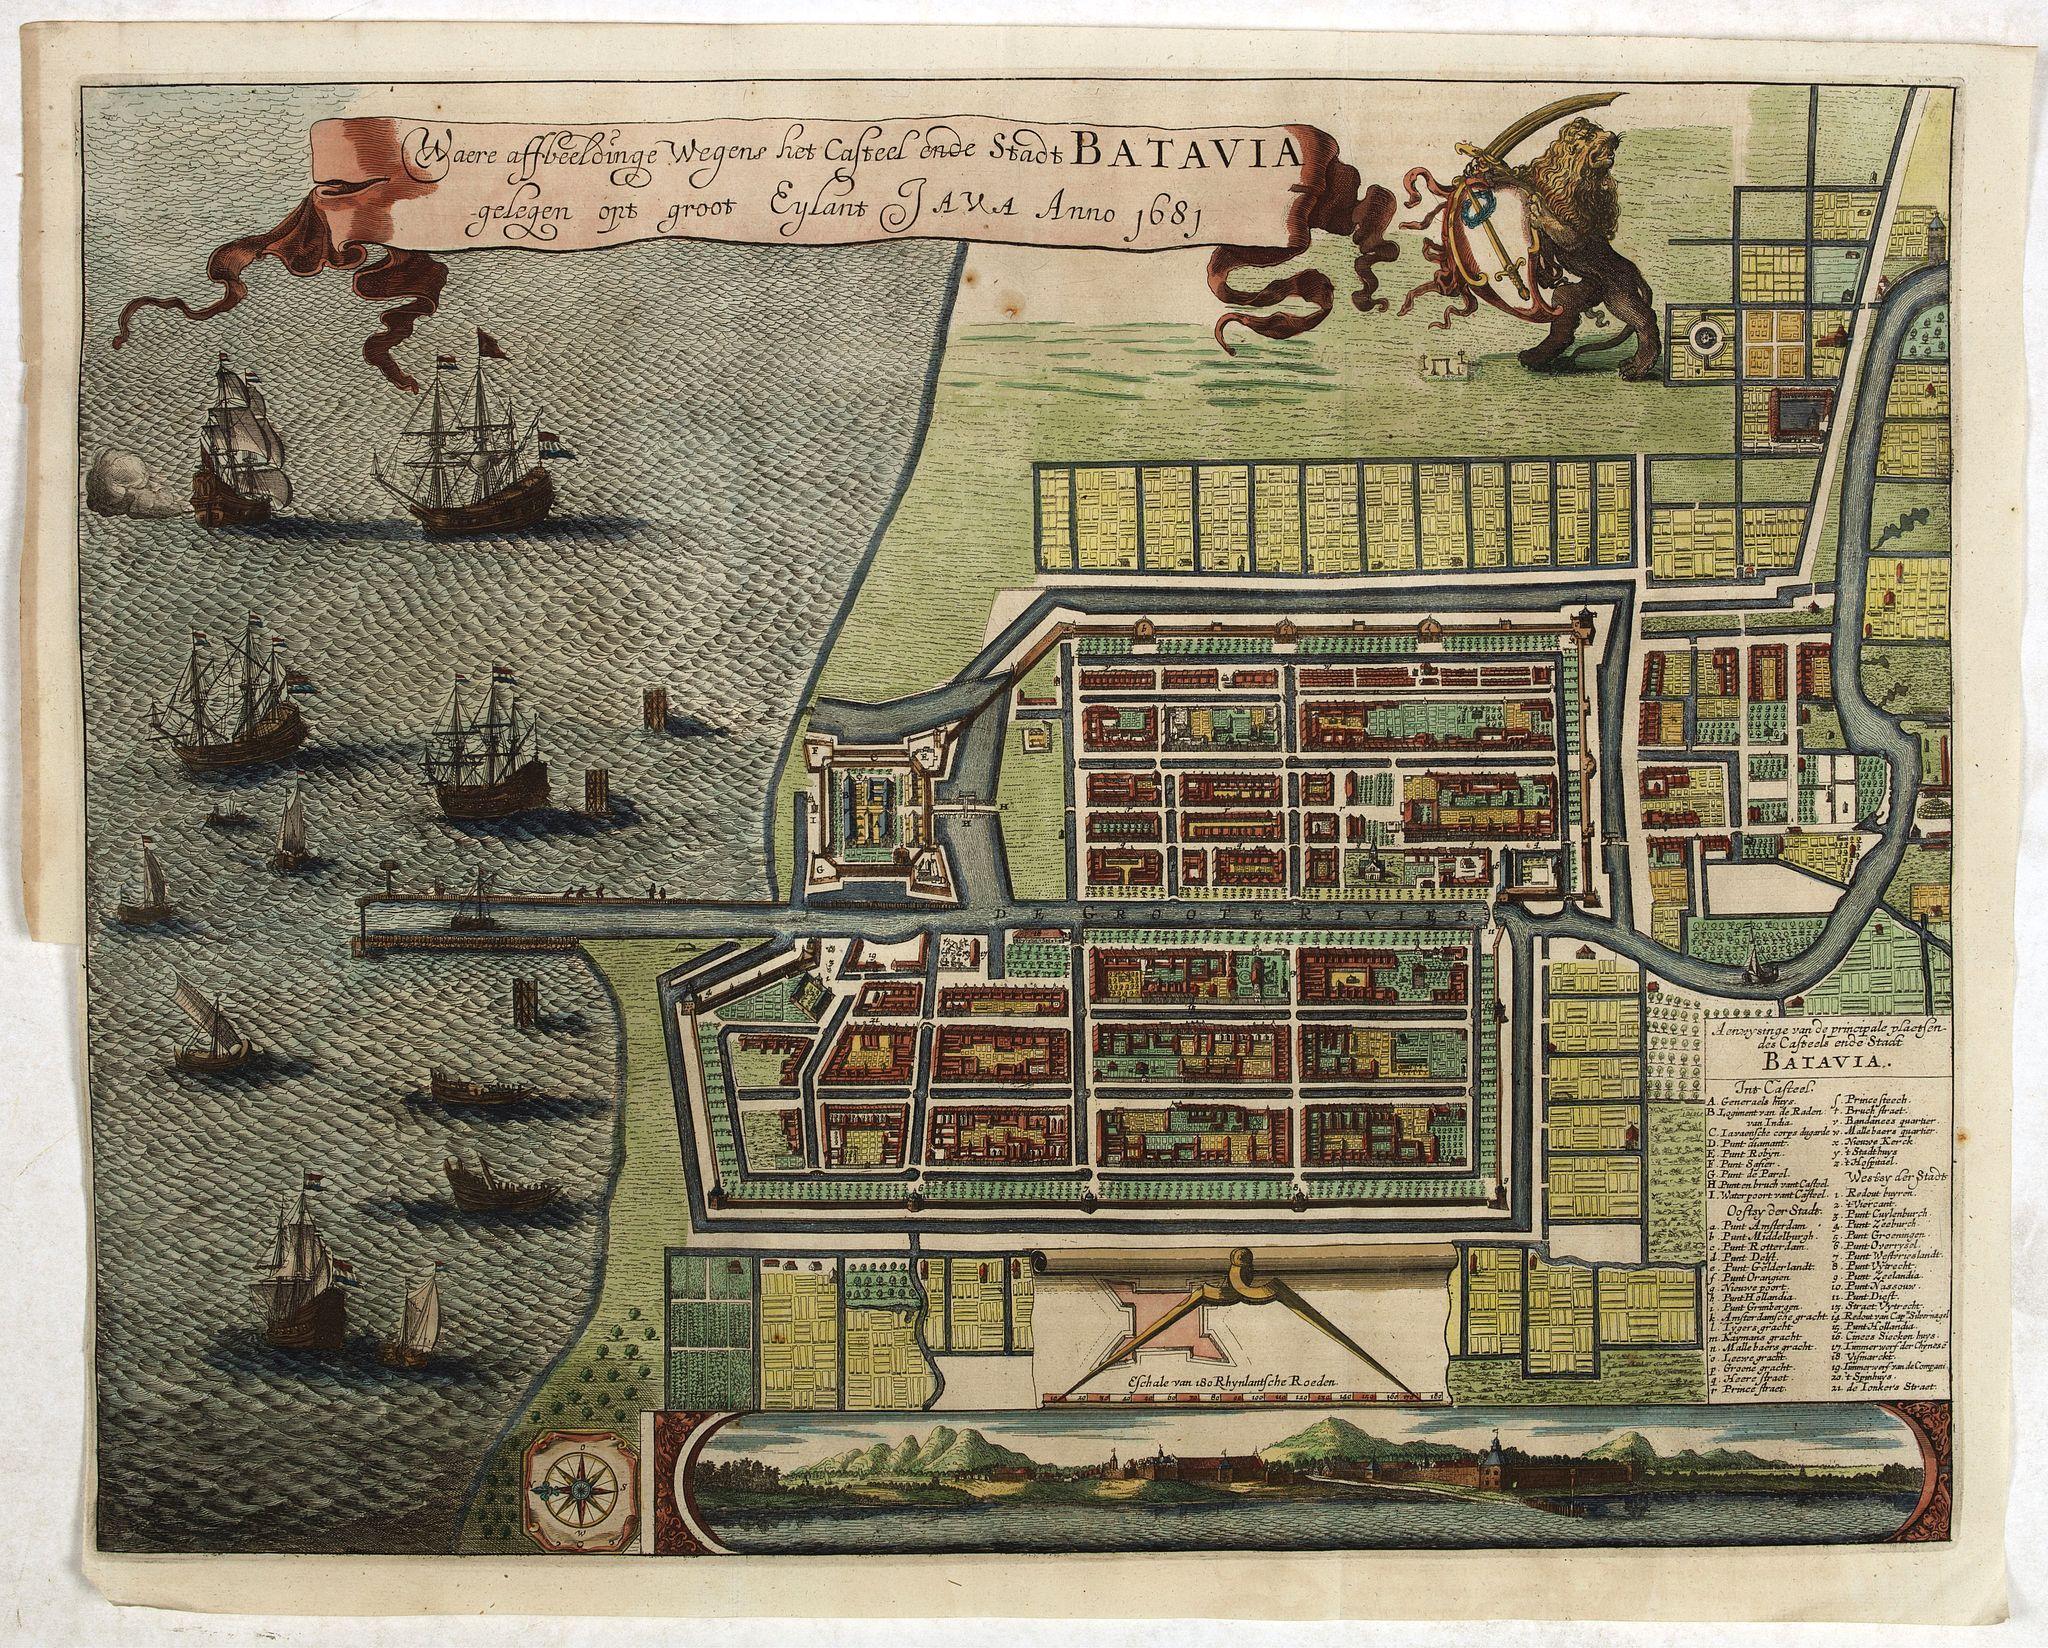 LETI, G. -  Waere affbeeldinge wegens het casteel ende stadt Batavia.